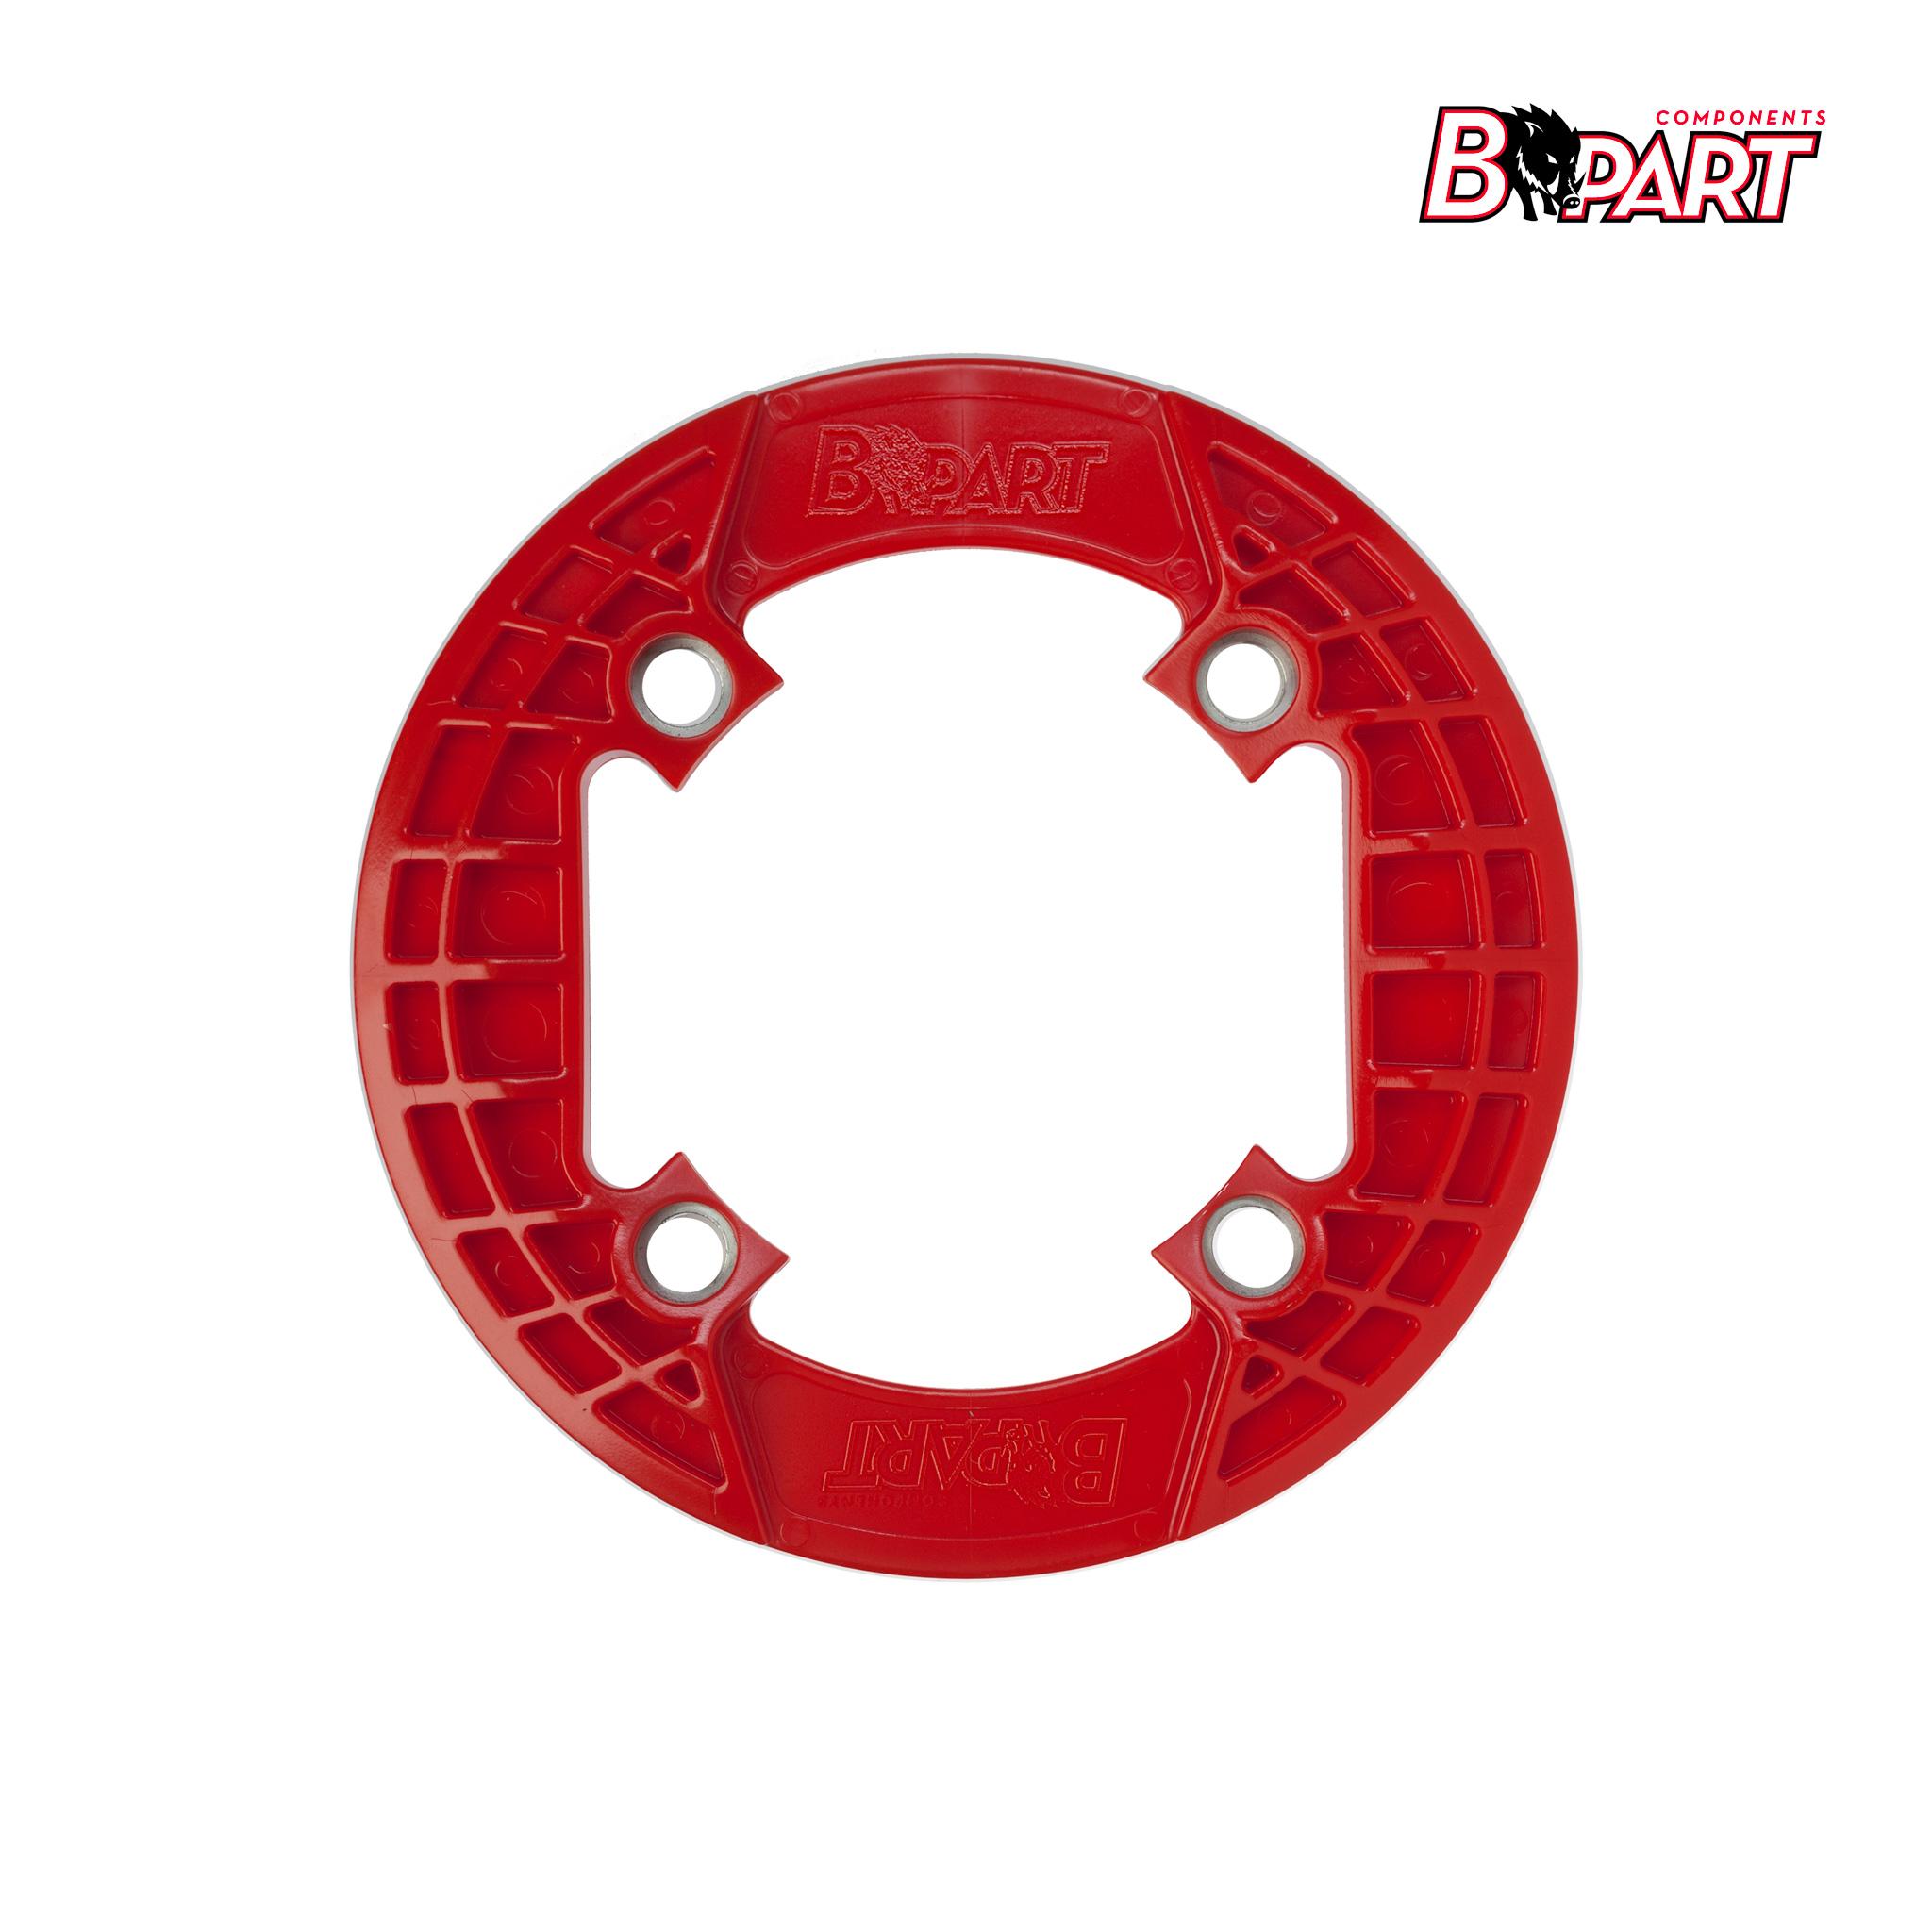 Bpart Components cubreplatos rojo